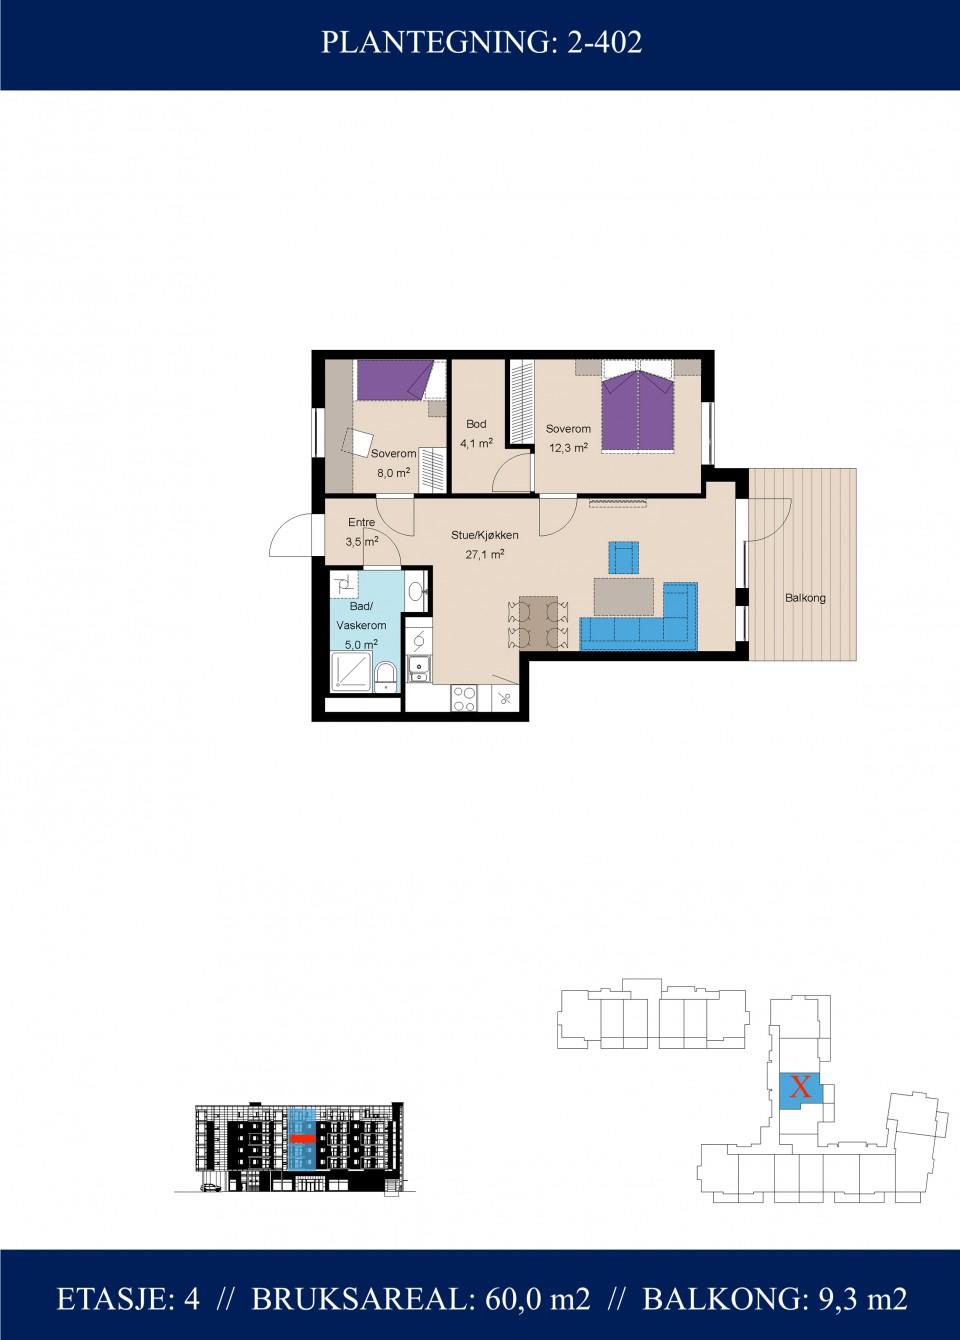 2-402-610-m2.jpg